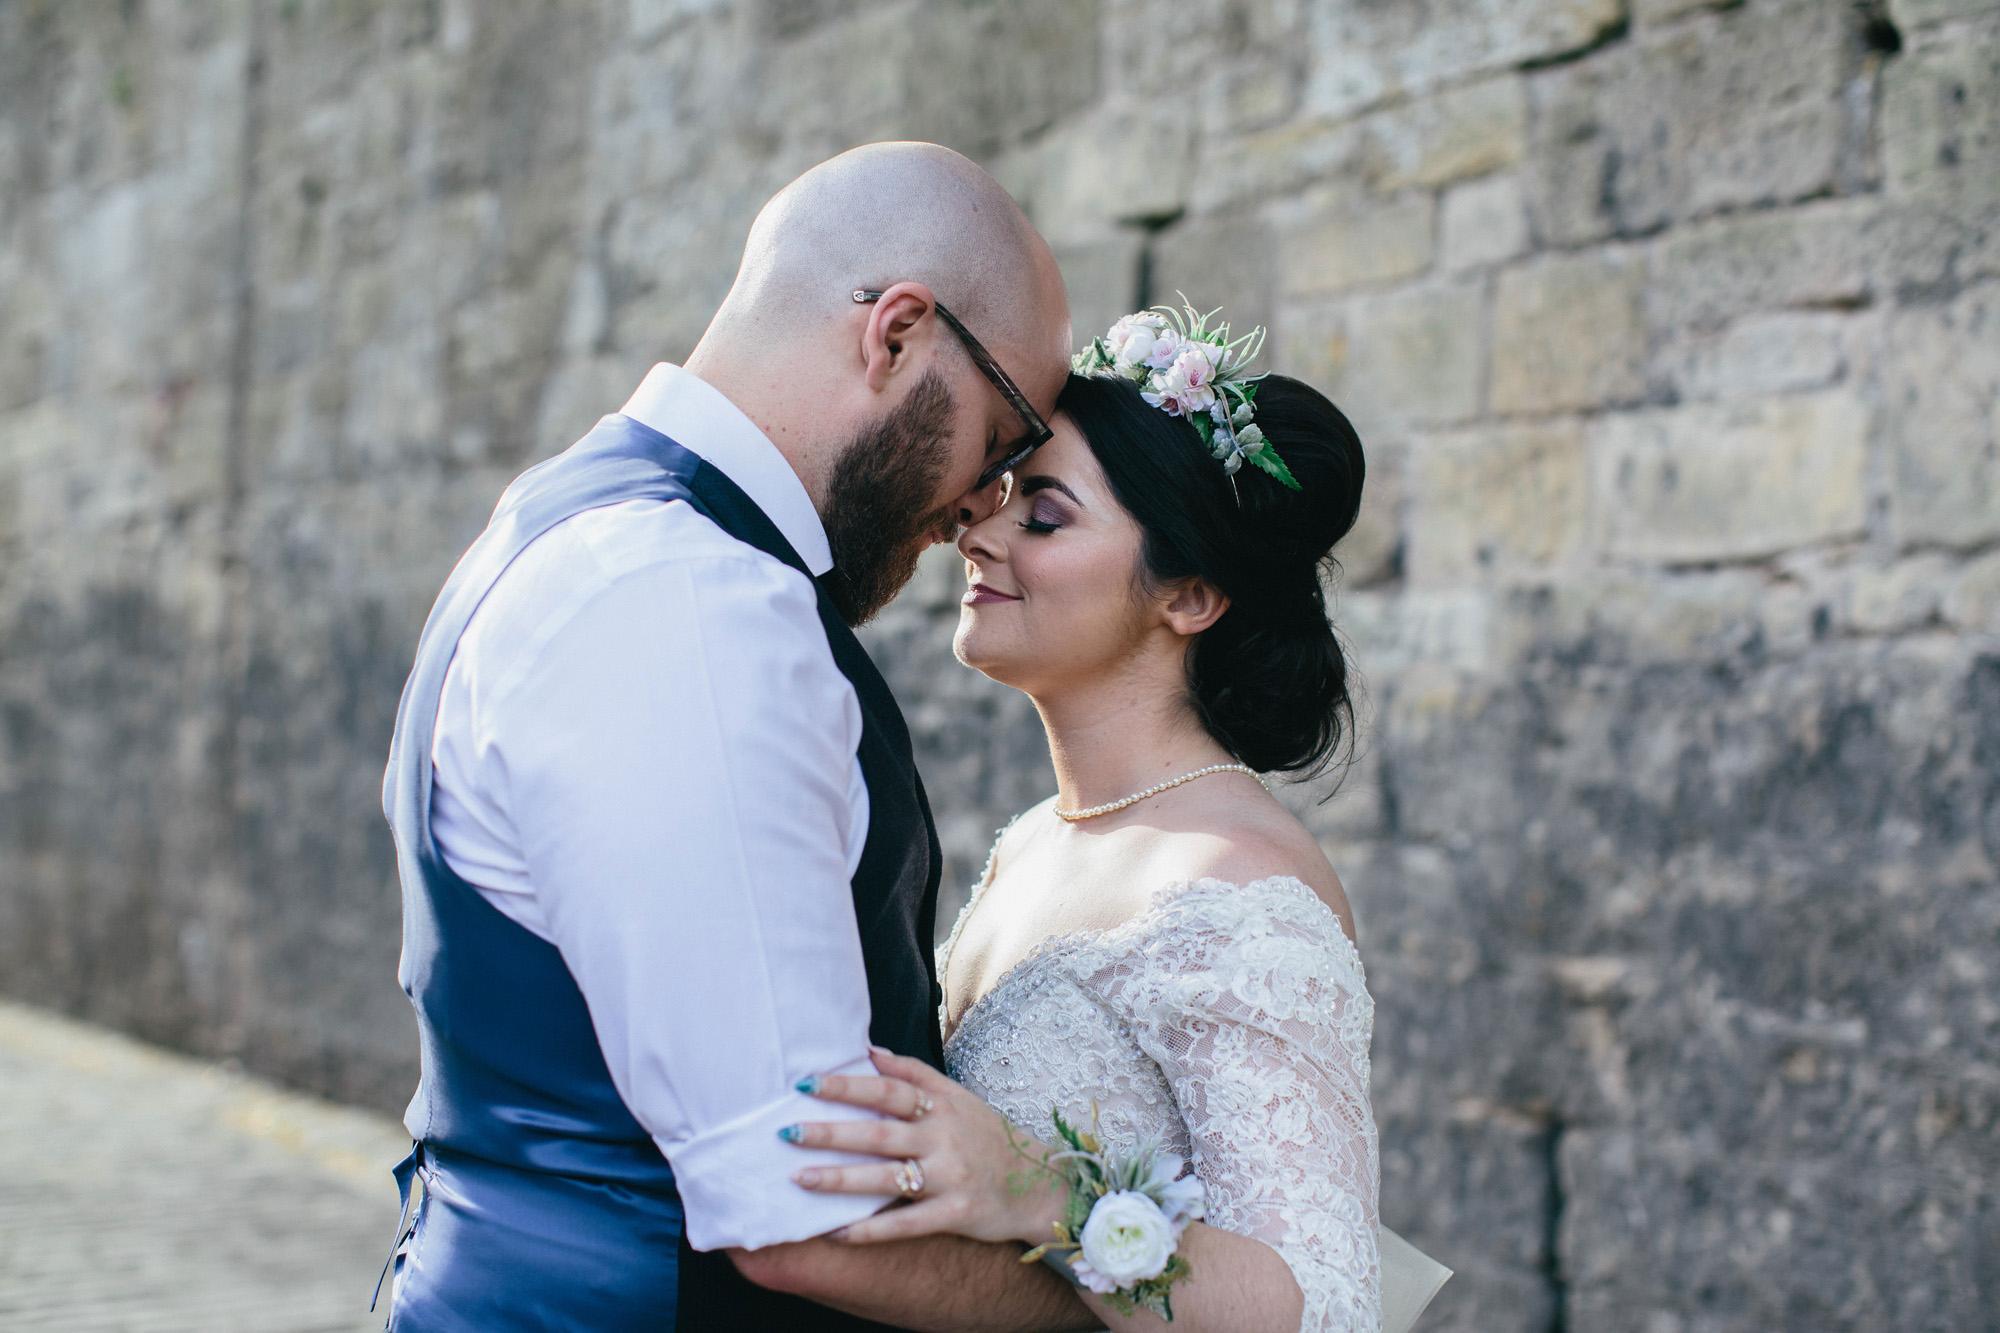 Quirky Wedding Photography Glasgow West End 062.jpg